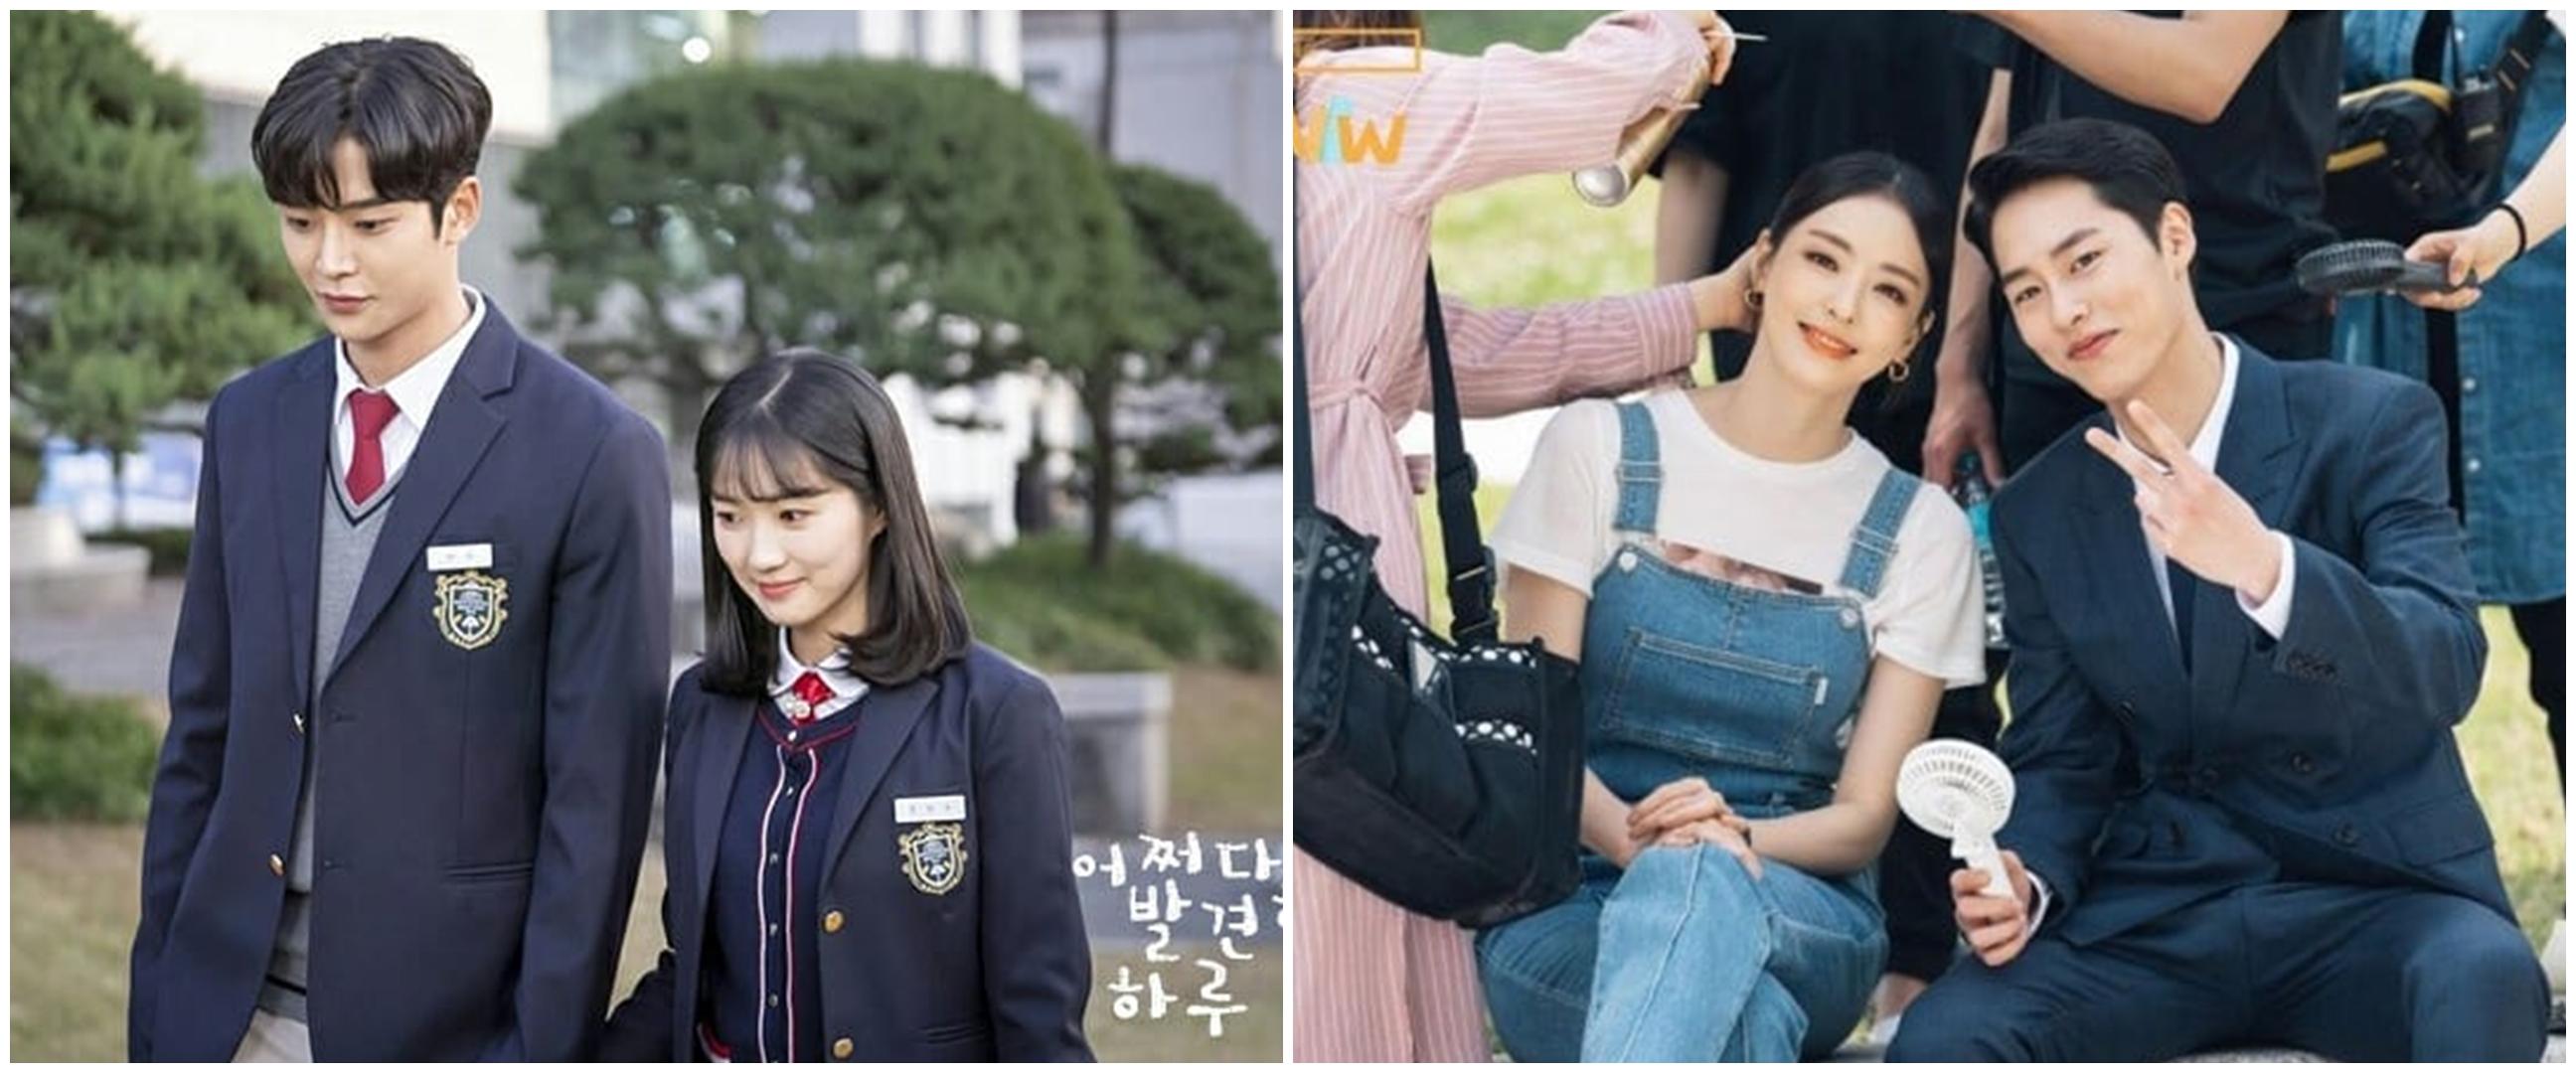 5 Drama Korea dengan tokoh dan alur mirip Extraordinary You